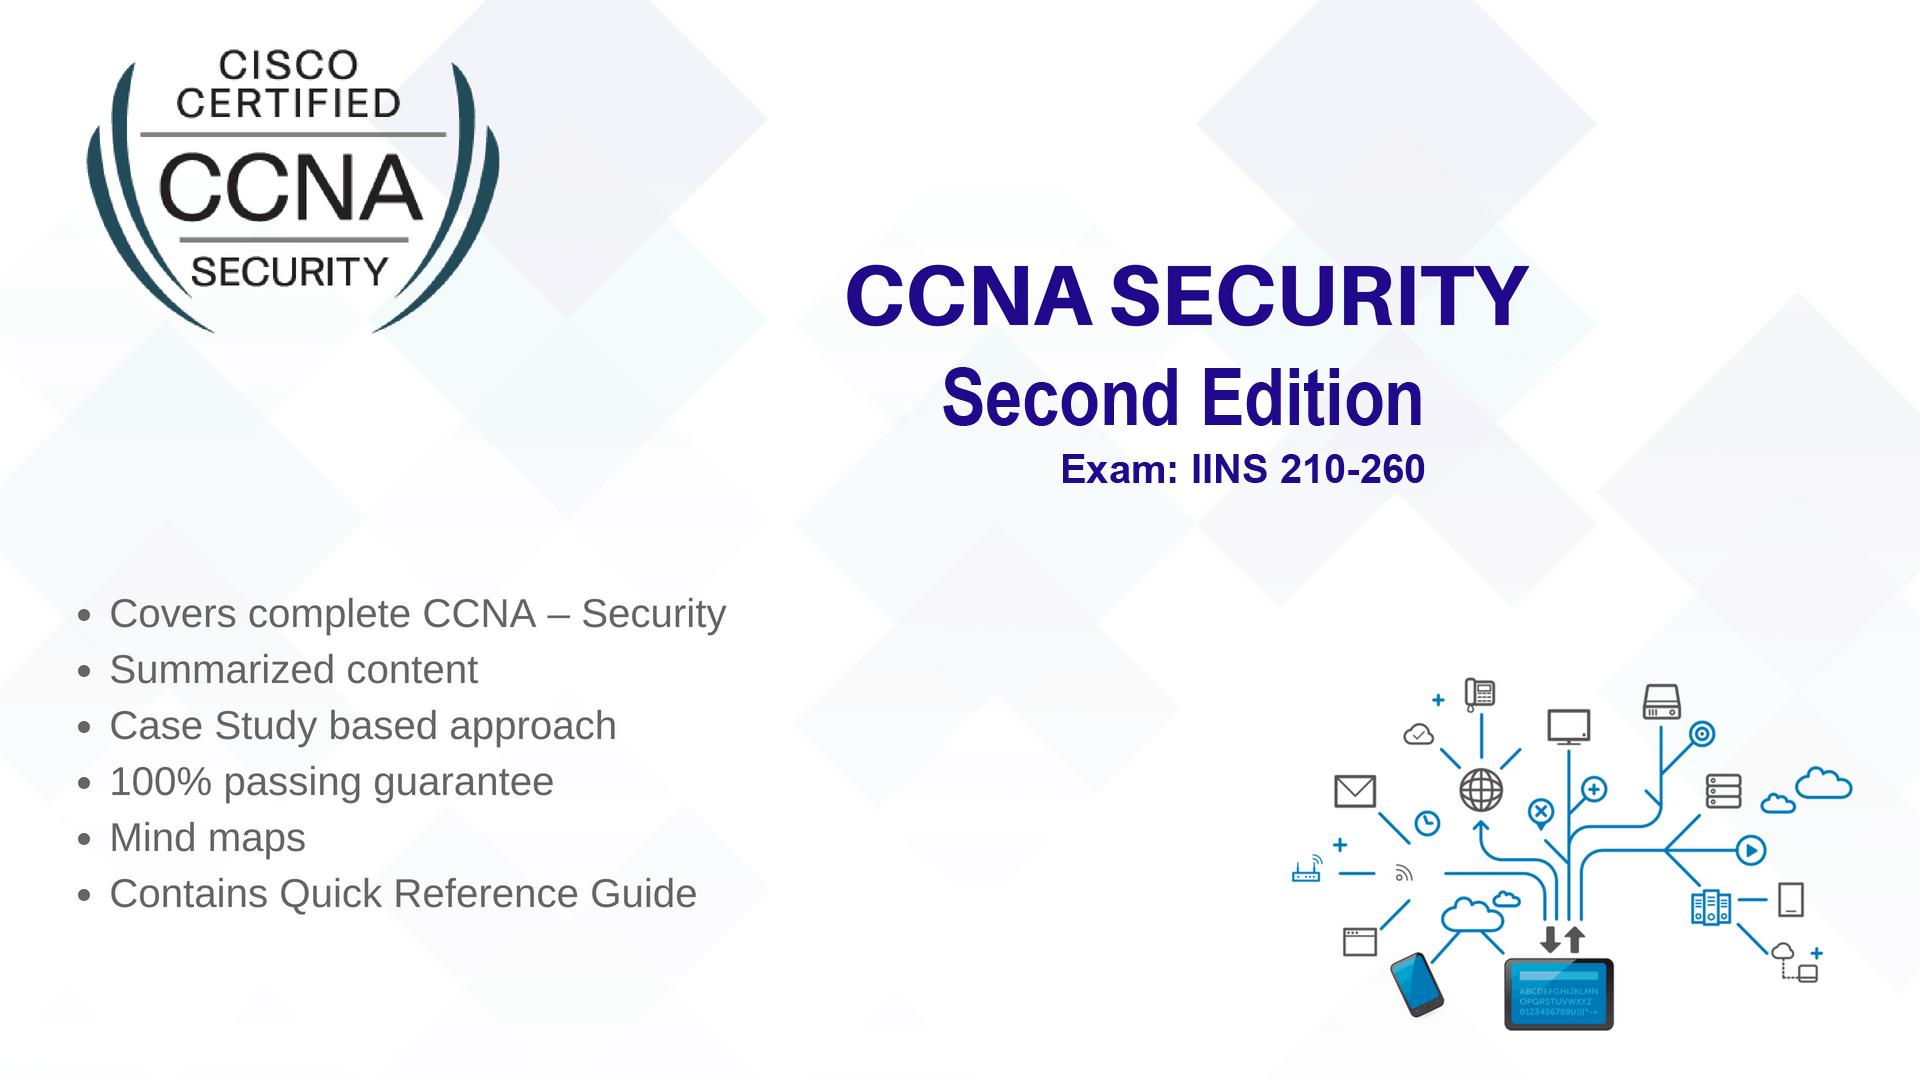 CCNA Security Second Edition